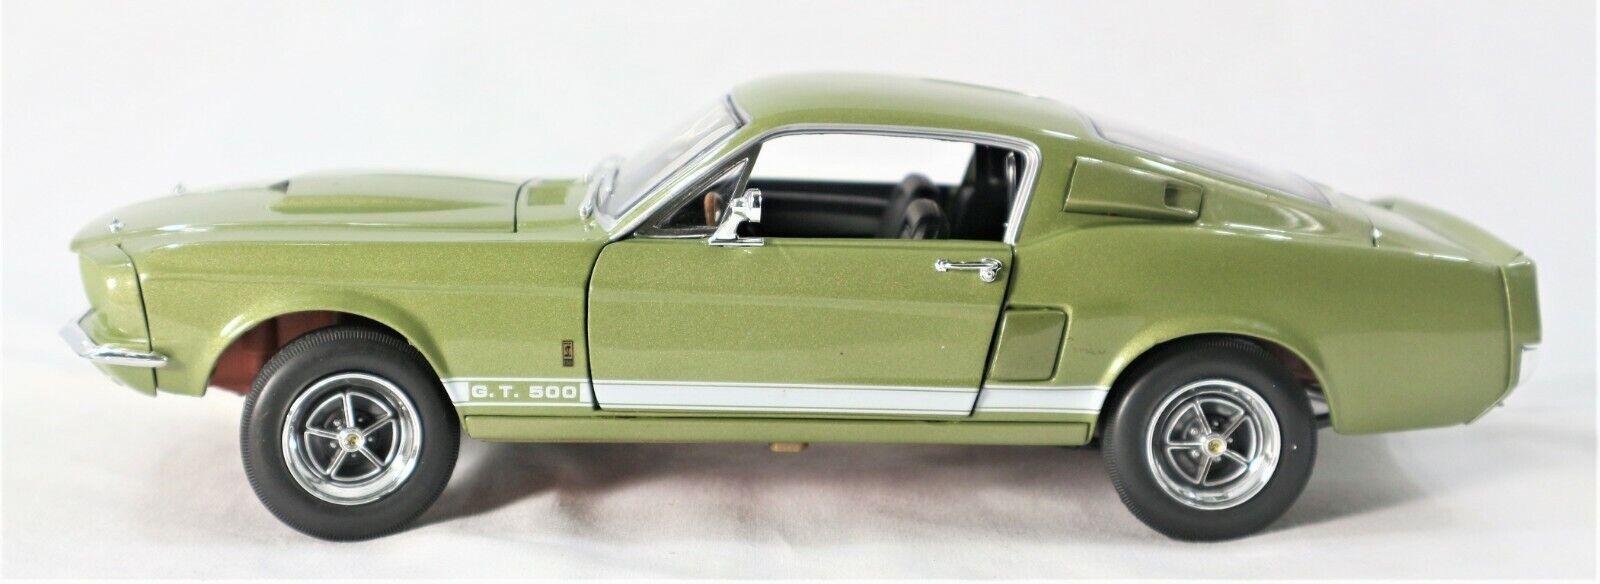 1967 SHELBY GT 500 DIE-CAST   18 SCALE modello auto   verde